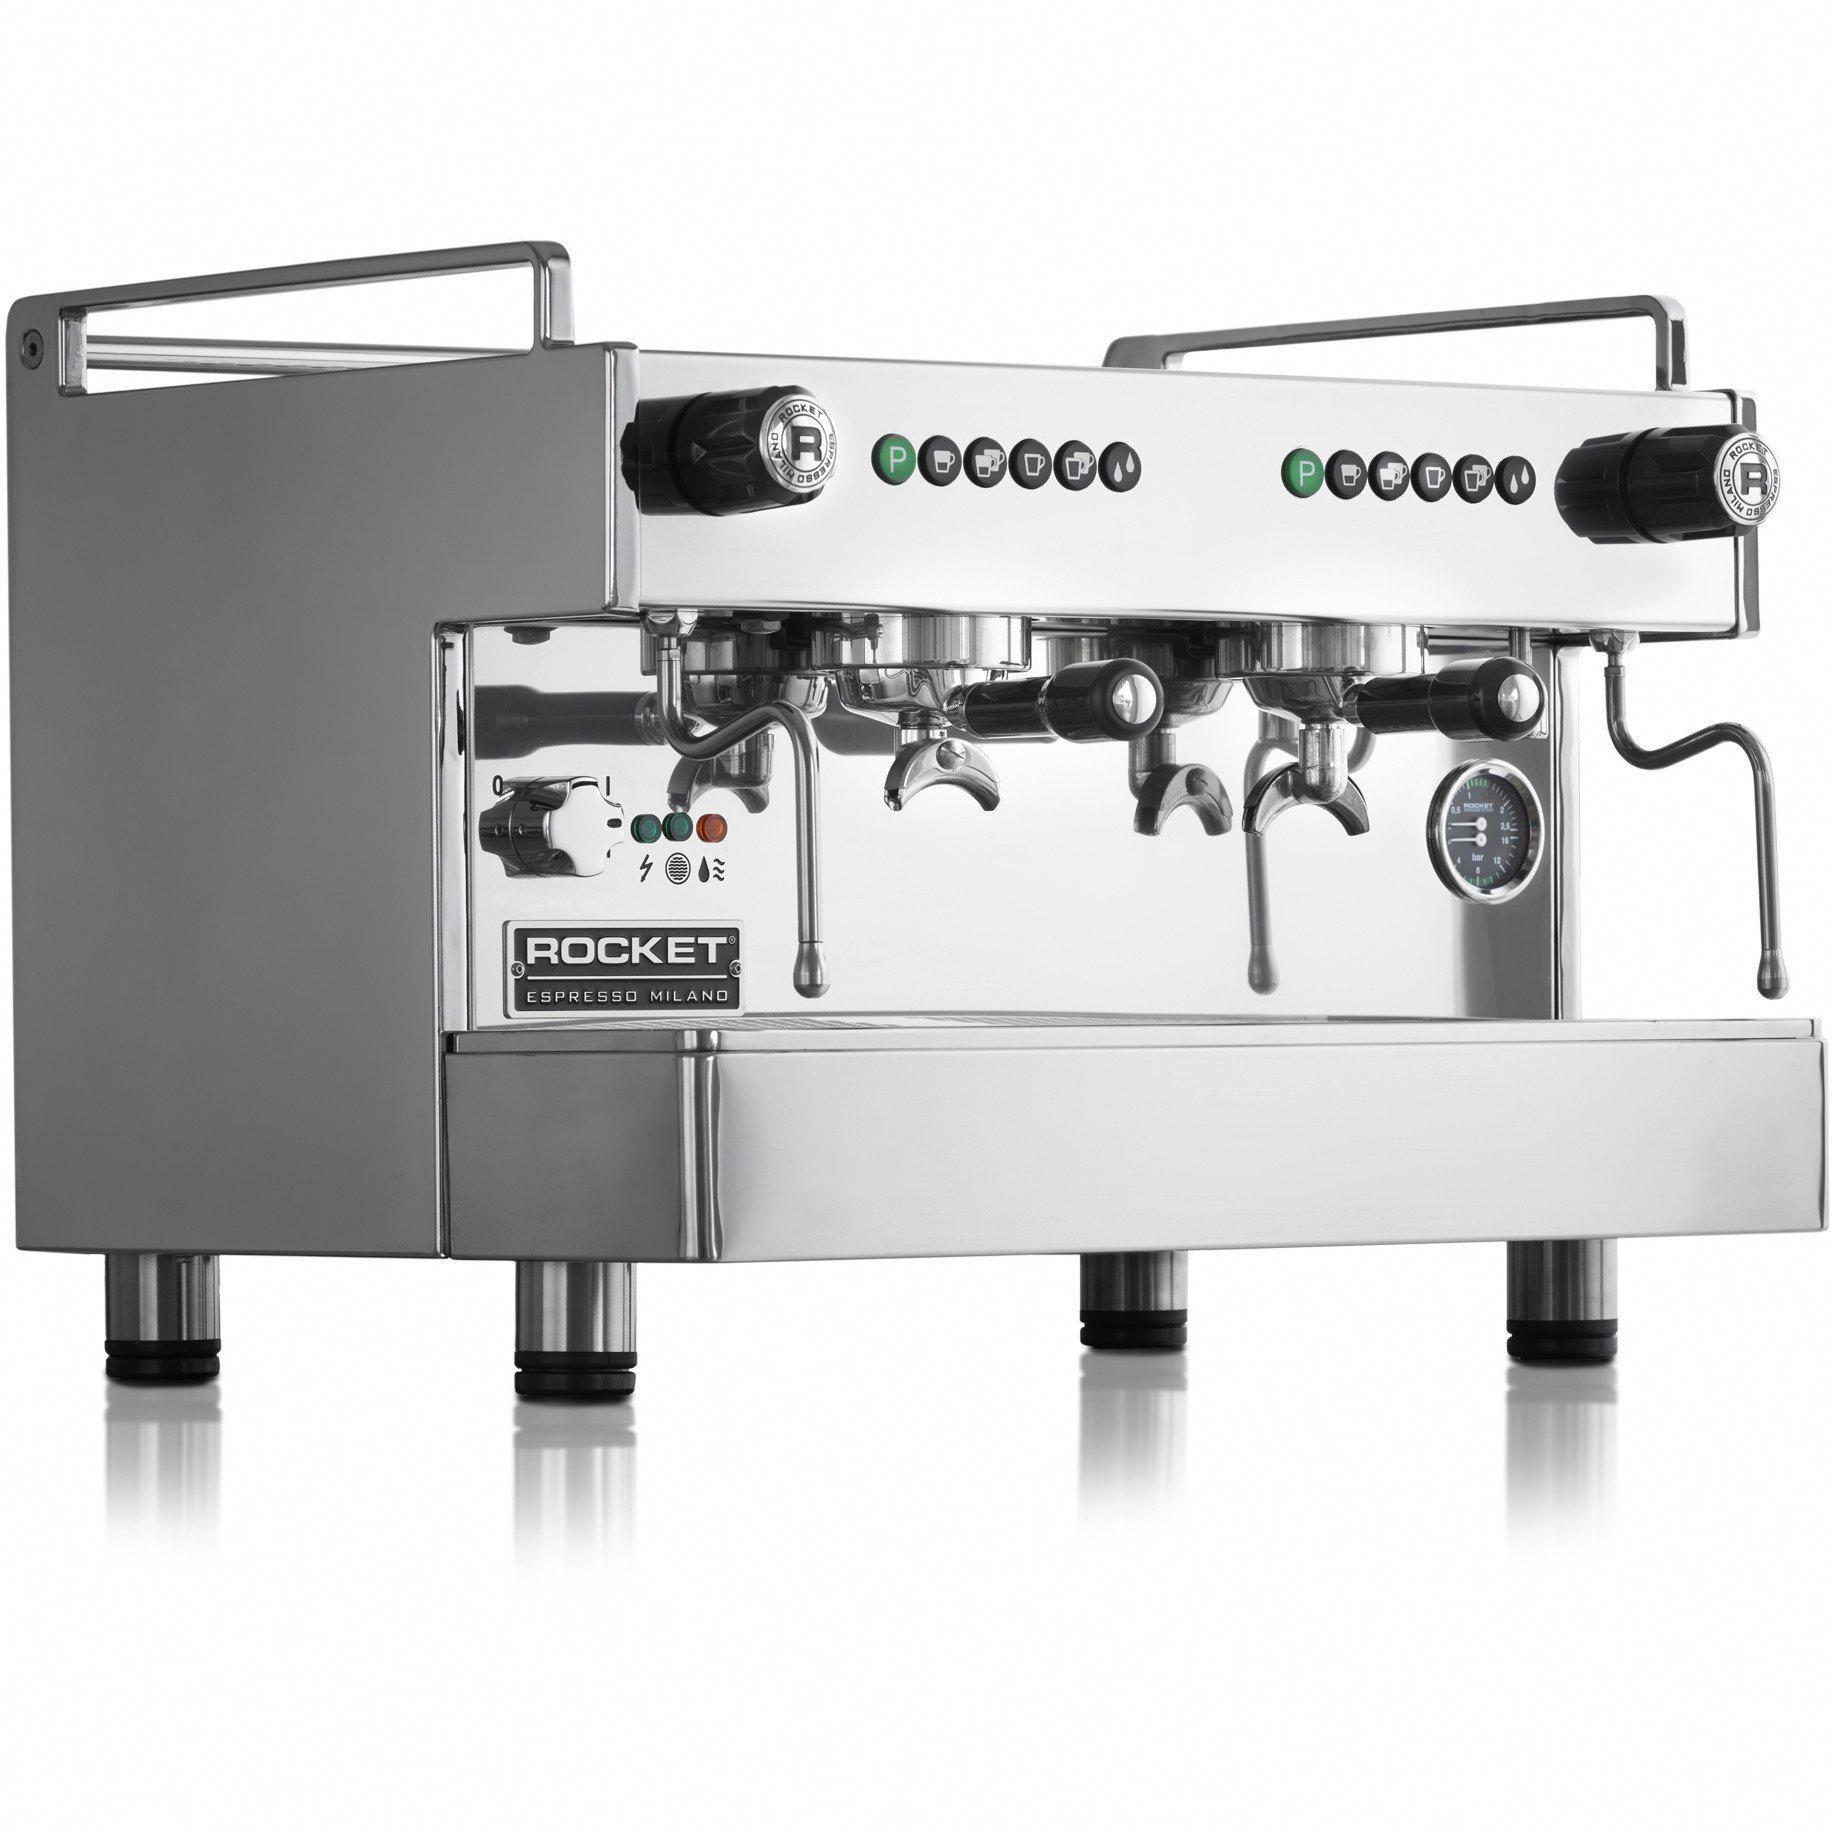 Rocket Espresso Boxer Alto Commercial Espresso Machine 2